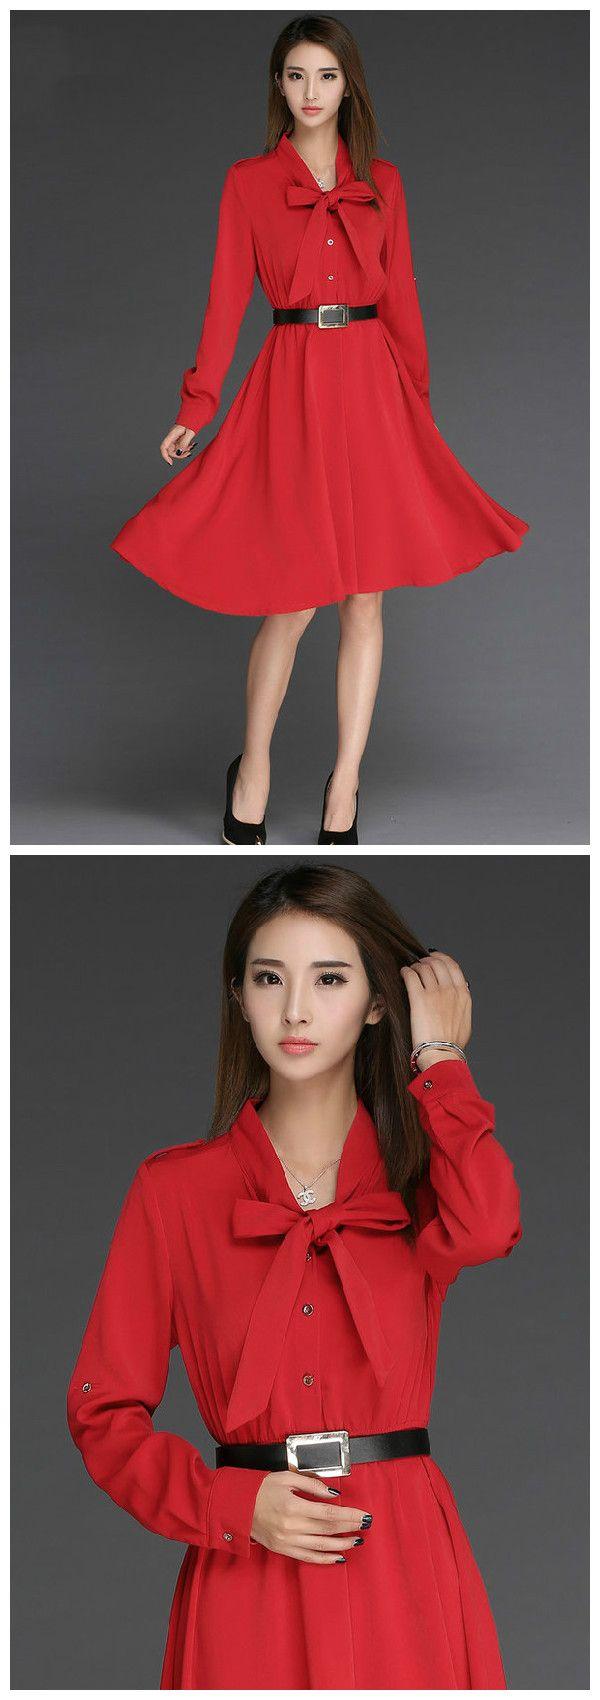 Korean new women long sleeve bow ball gown red chiffon dresses